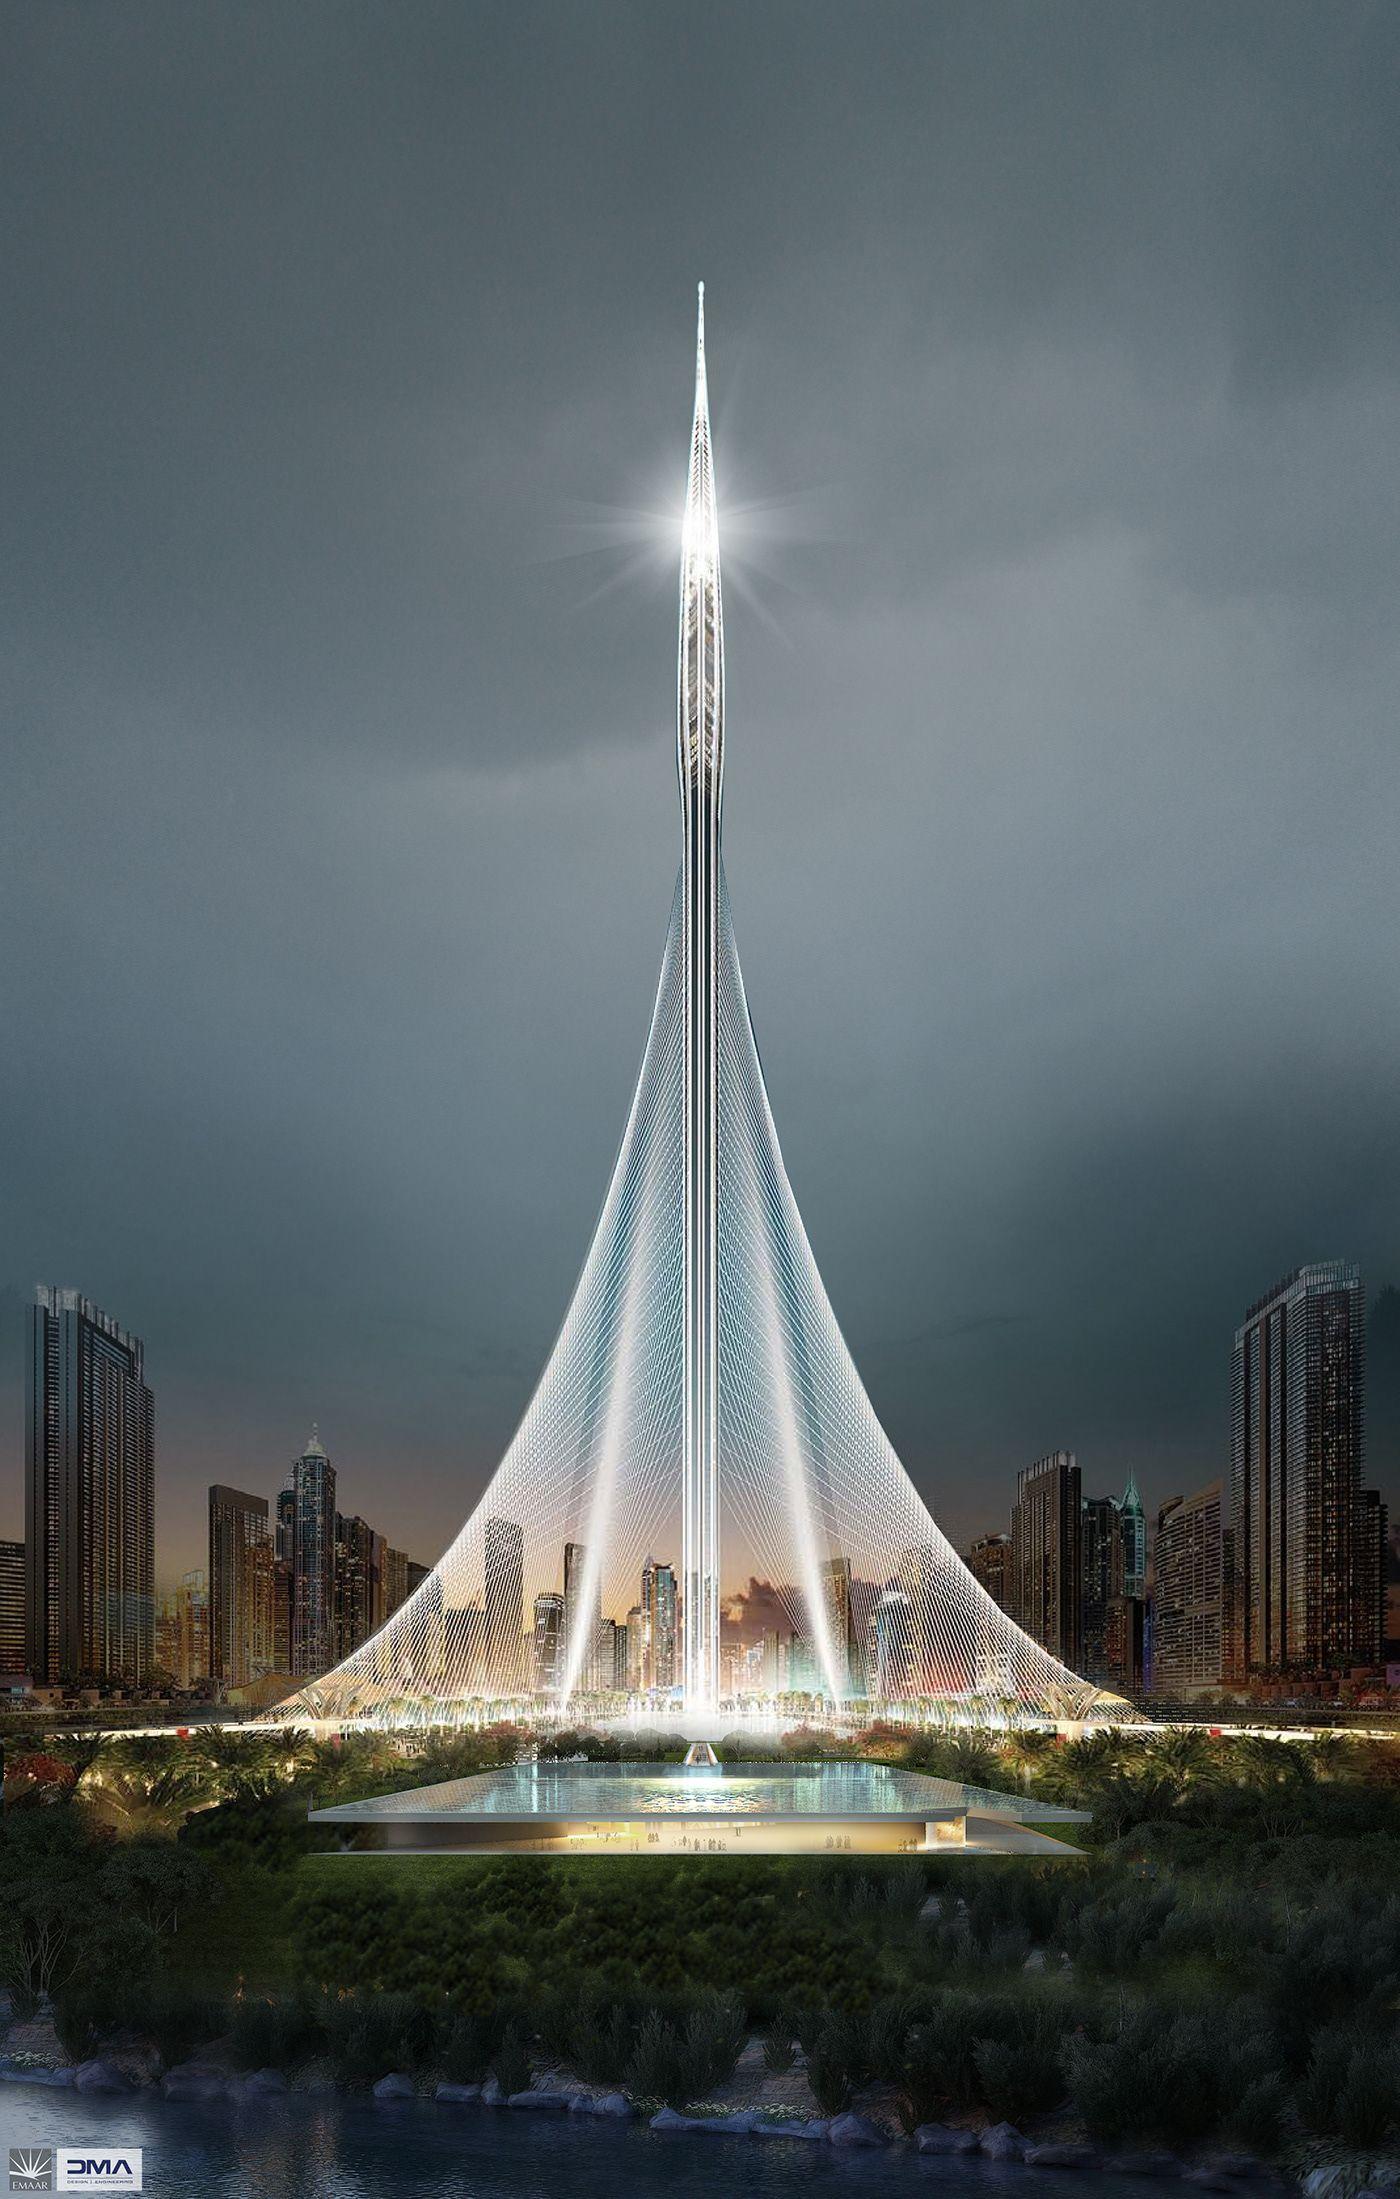 Dubai Creek Harbour Mosque Dubai Architecture Dubai Buildings Futuristic Architecture